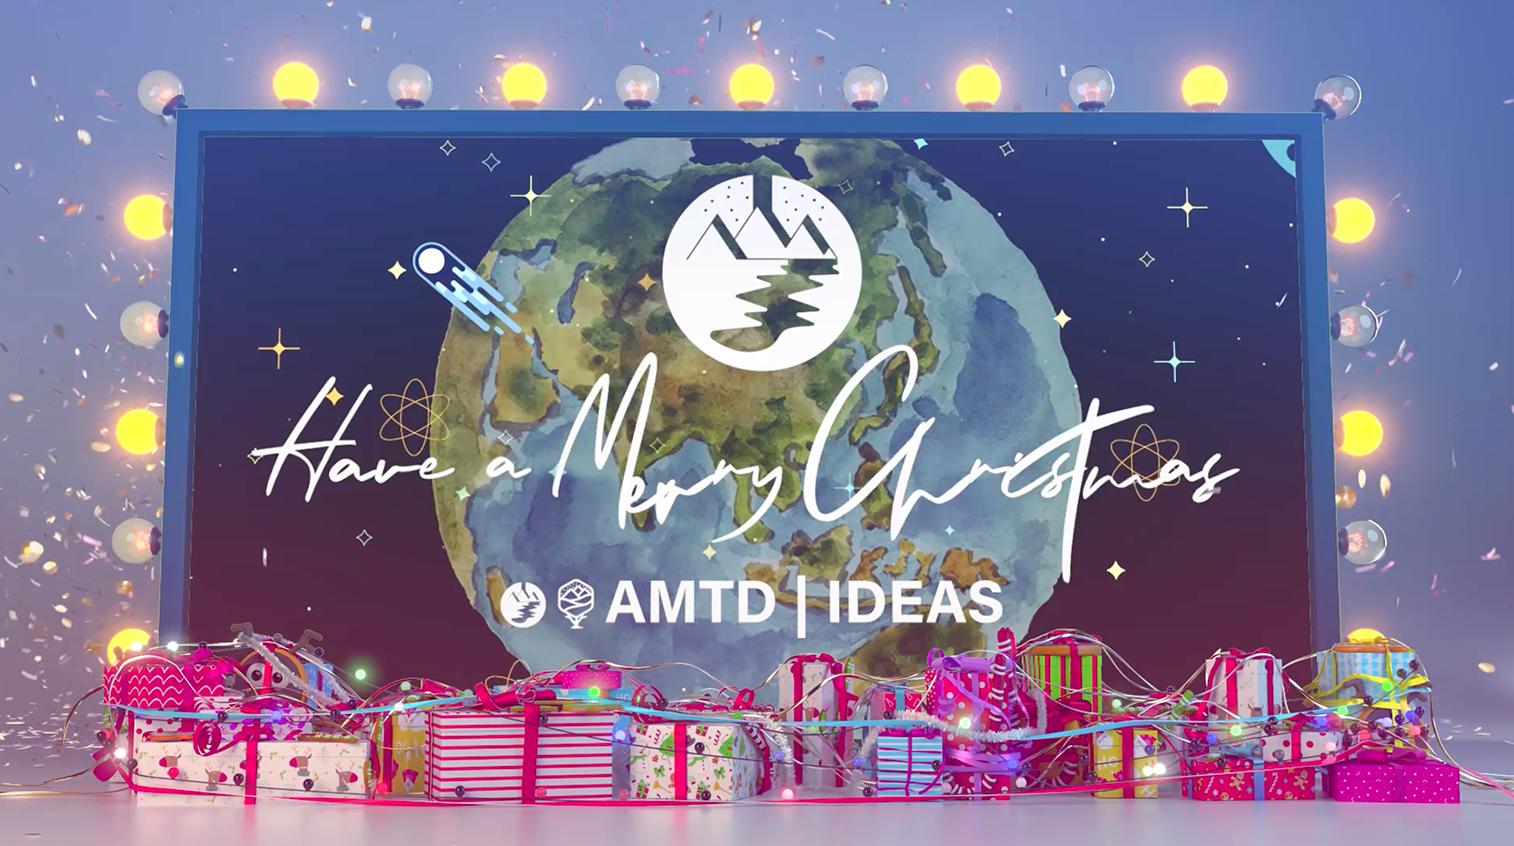 Season's Greetings from AMTD